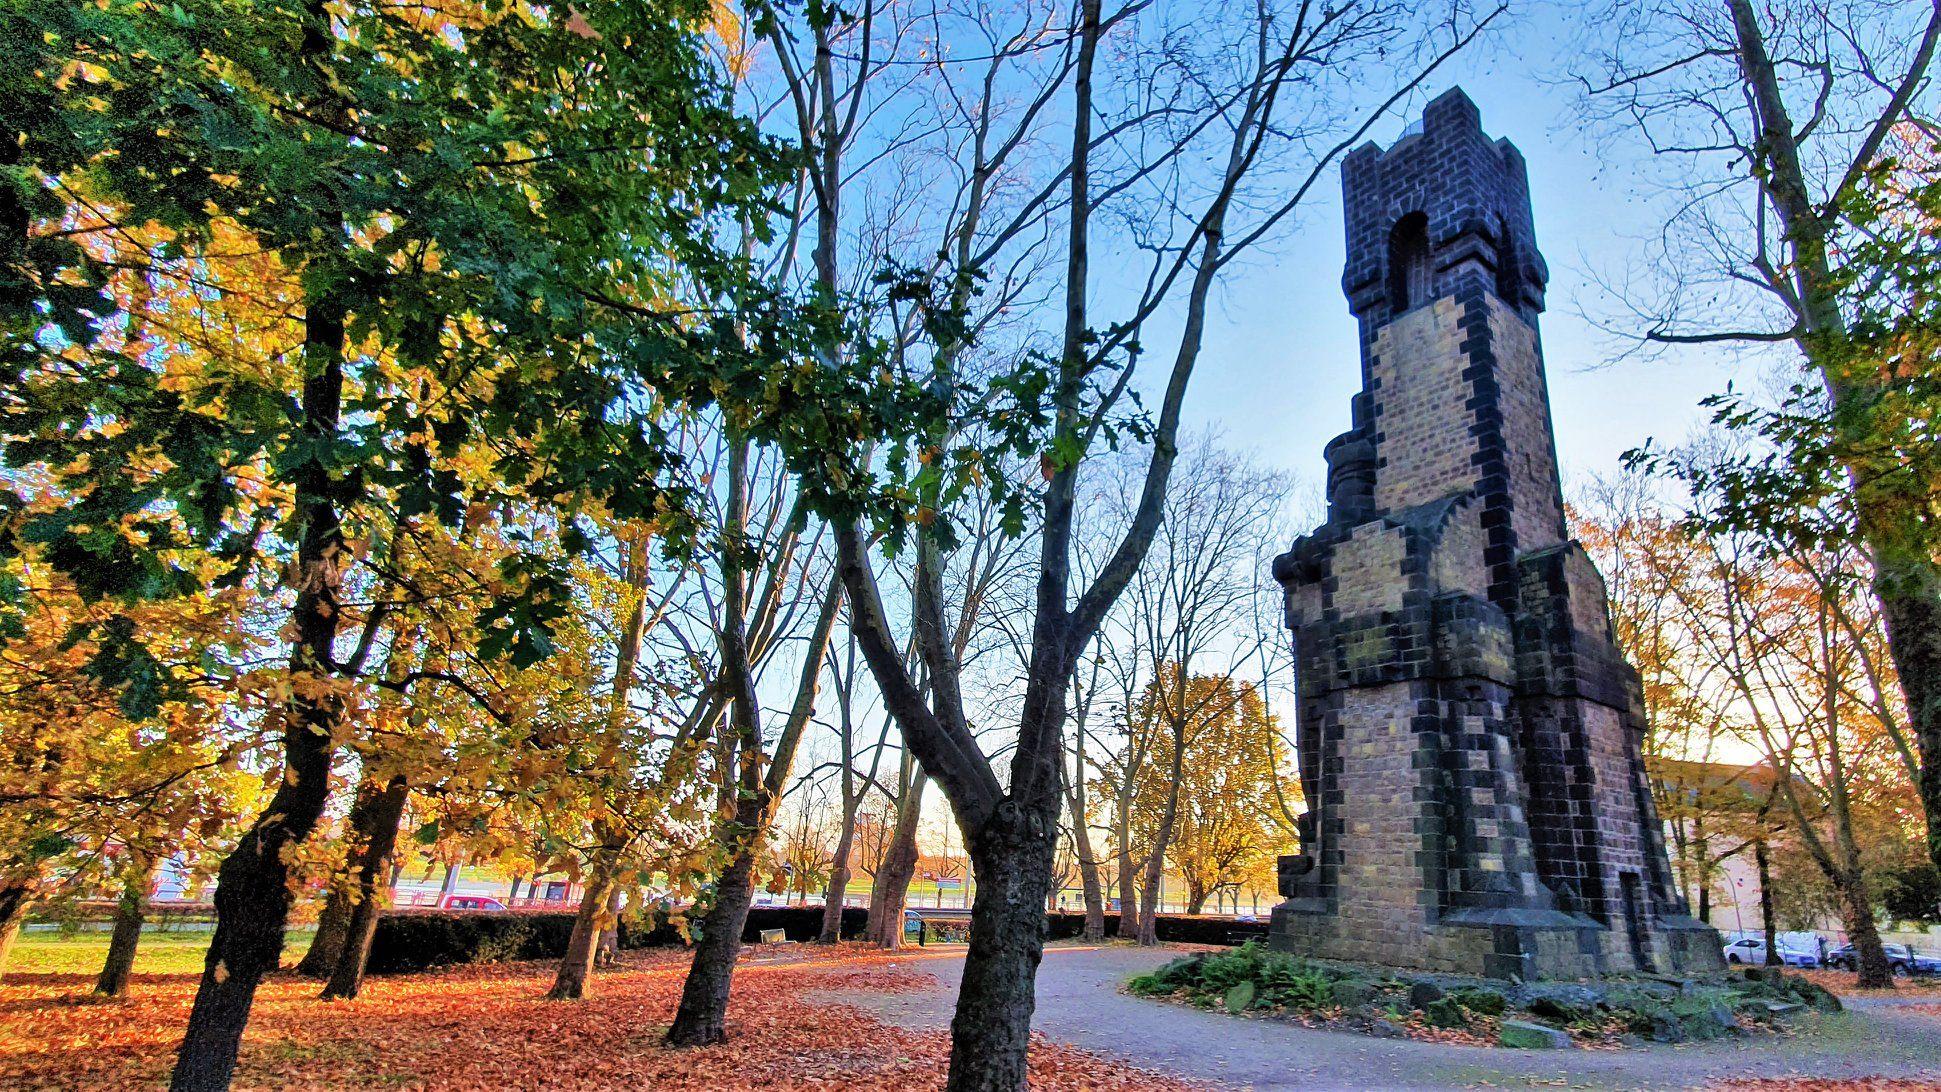 Marienburg, Bismarckturm